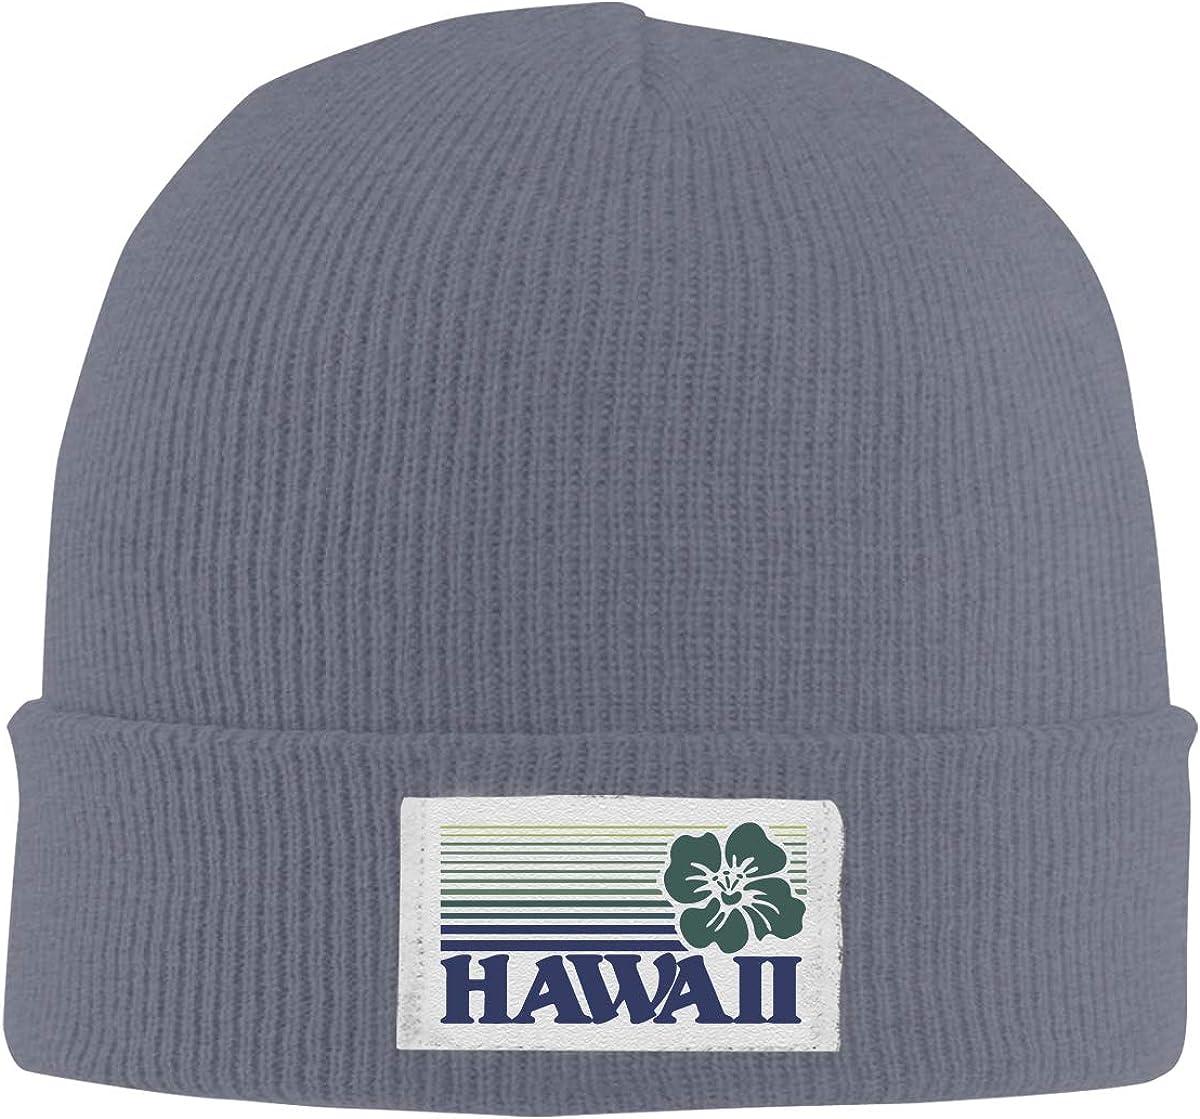 ASDGEGASFAS Unisex Hawaii Skull Cap Knit Wool Beanie Hat Stretchy Solid Daily Wear